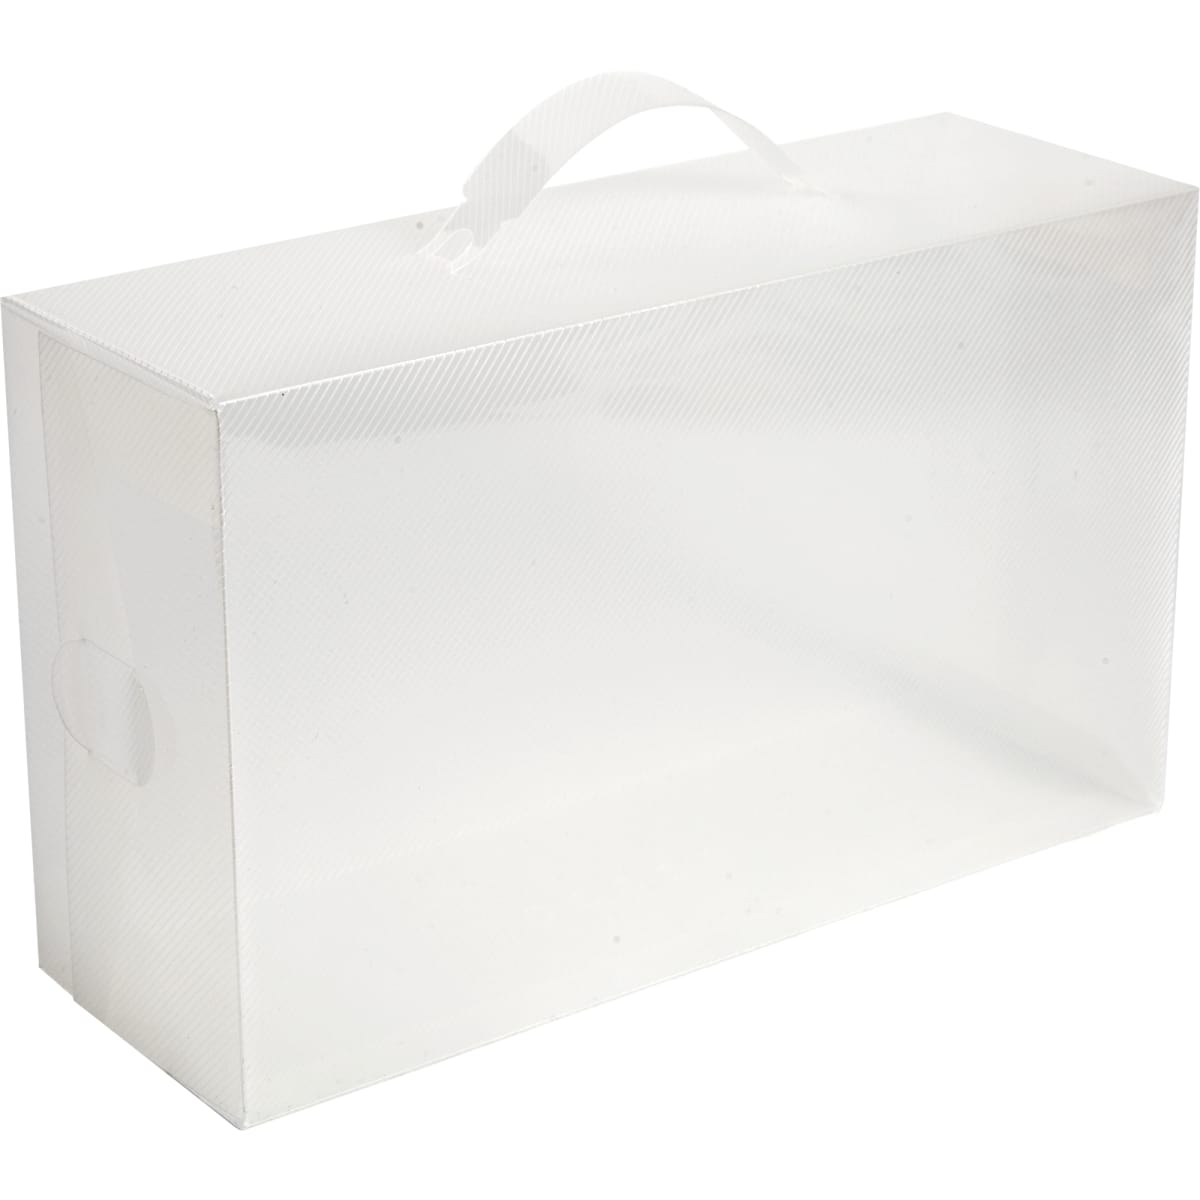 Набор коробов Handy Home 30х10x18 см, пластик цвет прозрачный, 2 шт.